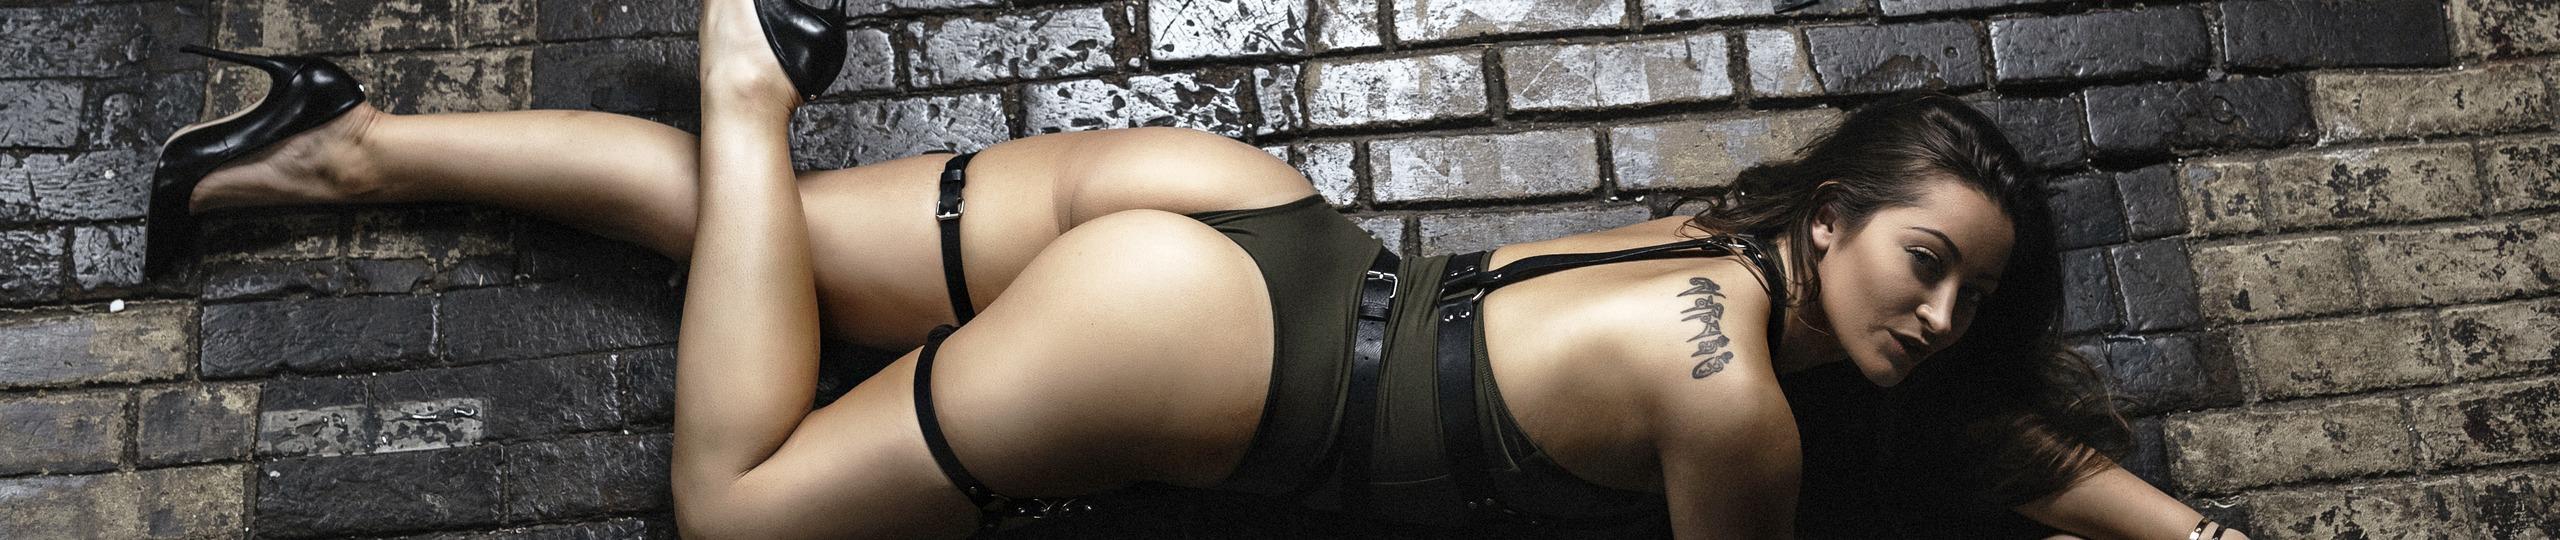 Dani Daniels - profile image